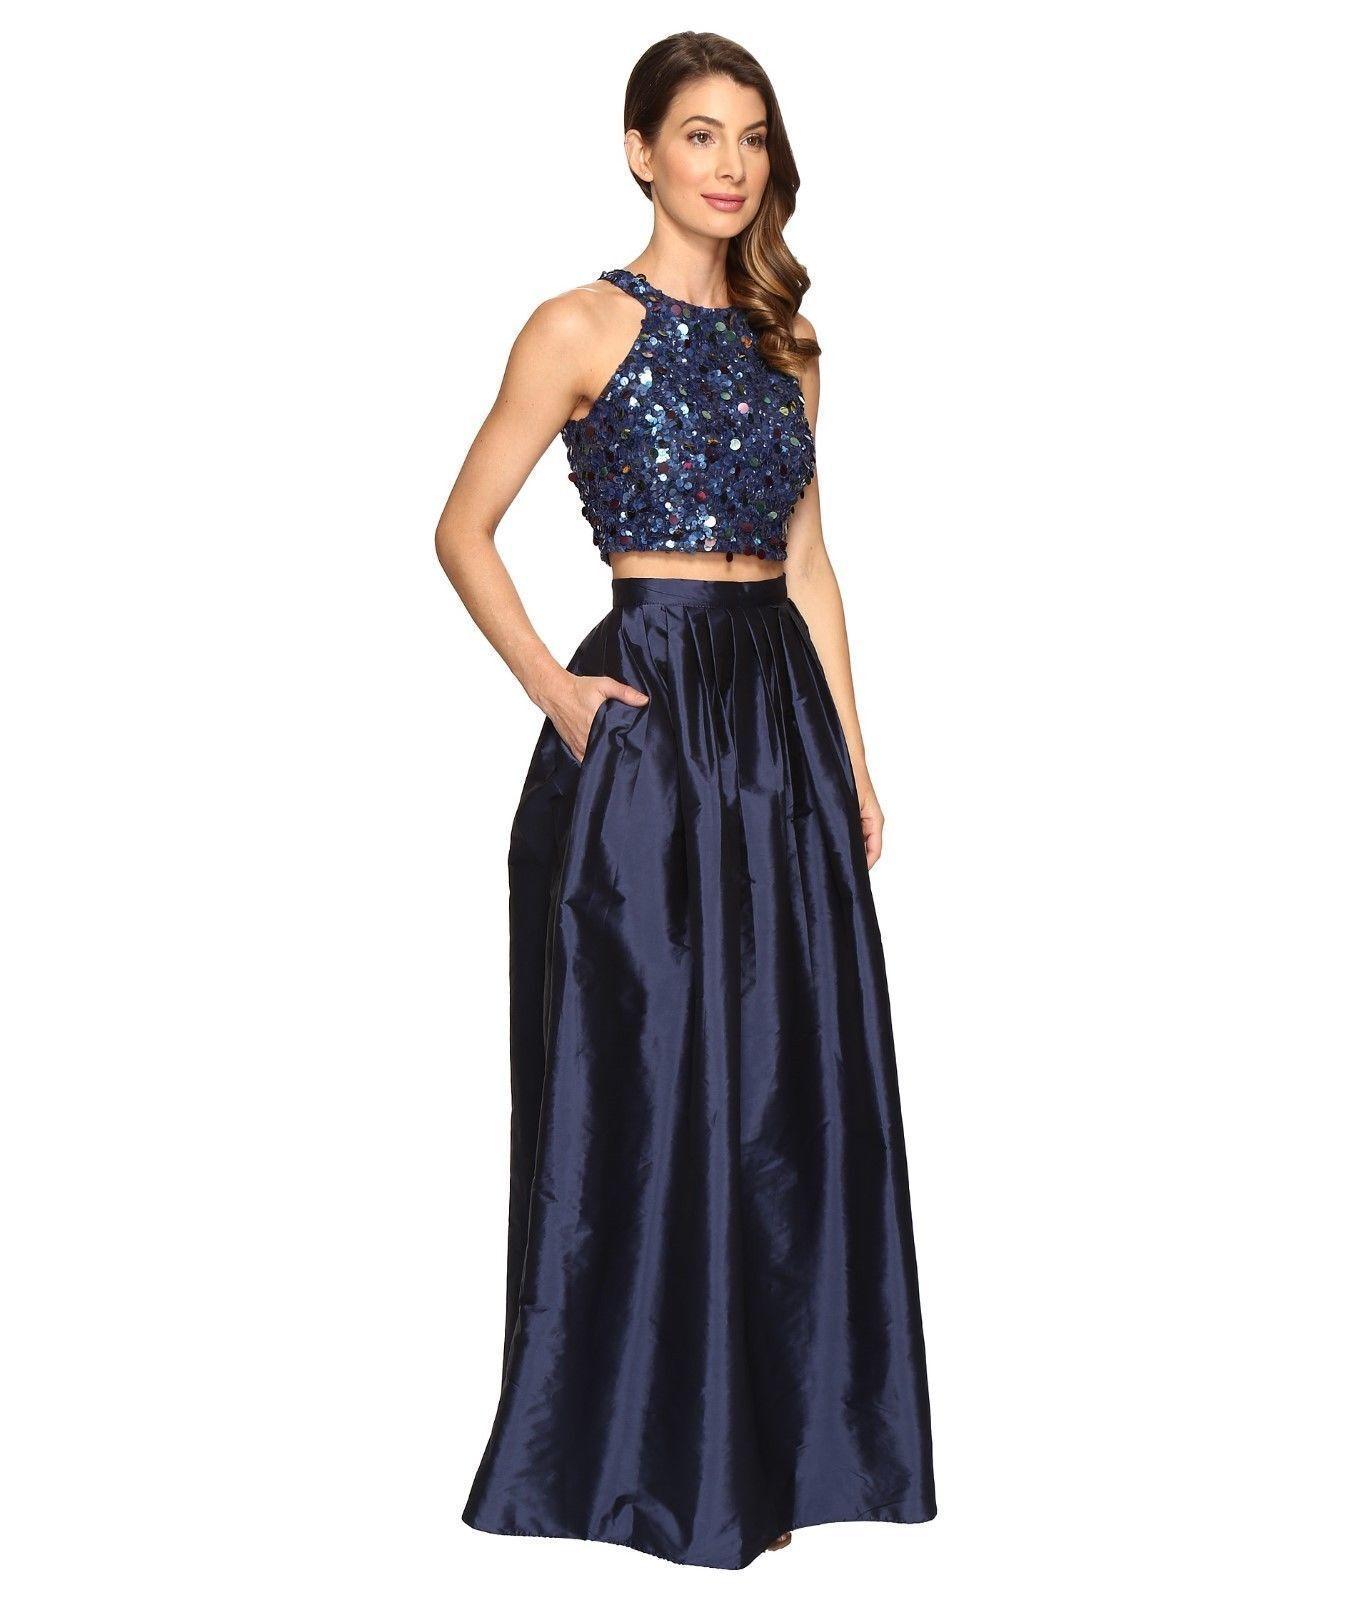 NWT  Adrianna Papell Embellished Two-Piece Ballgown [Größe  2P]  N617